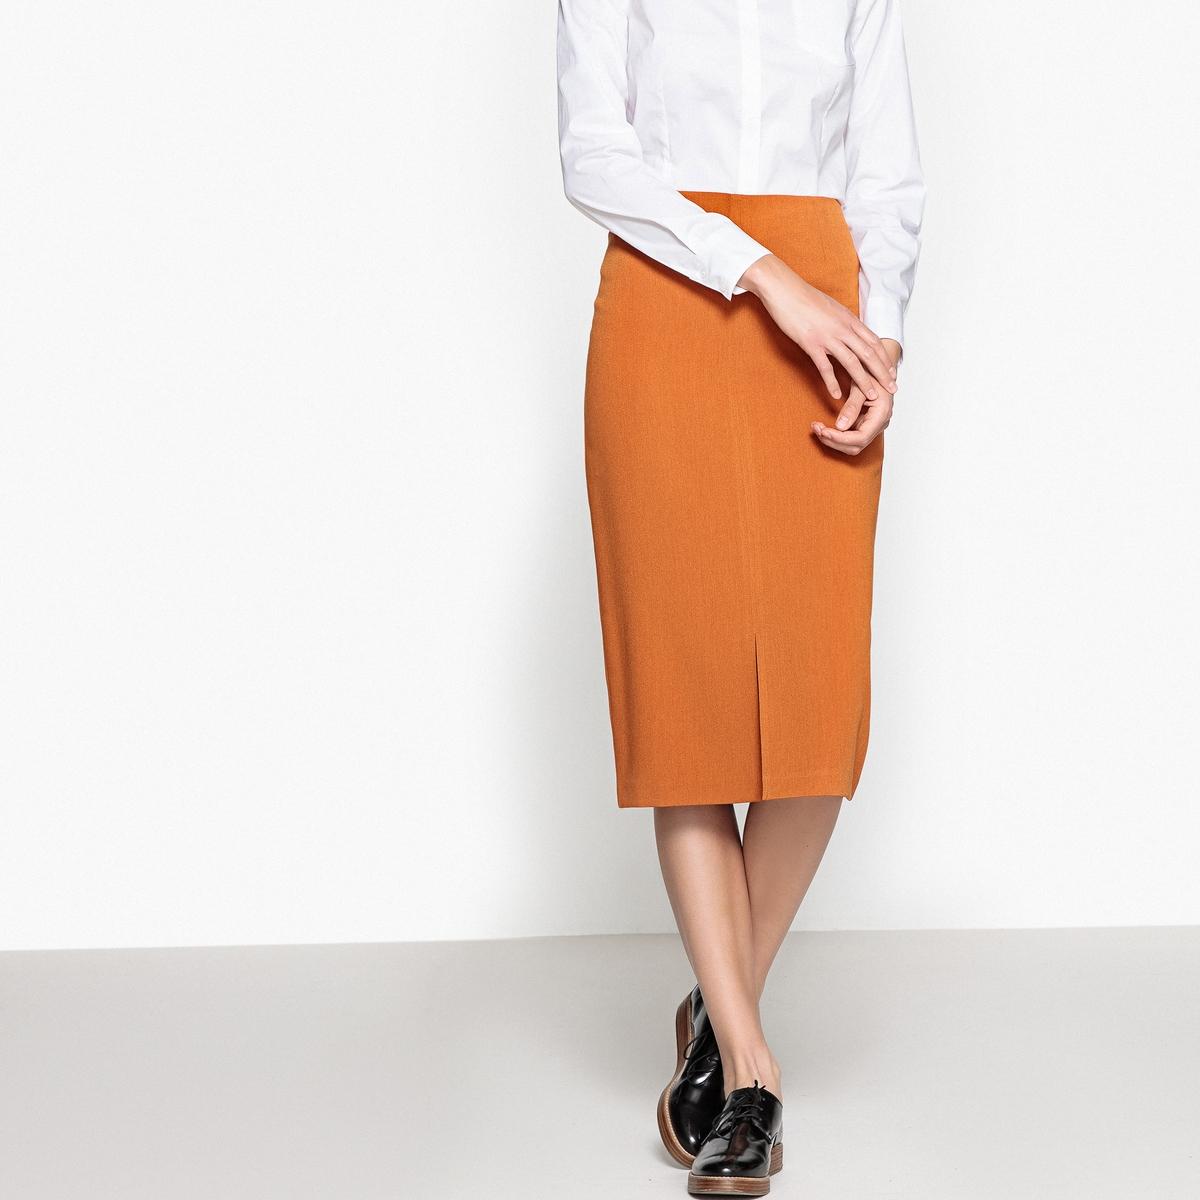 f1647c64f654a Женщинам - Одежда - Юбки - Макси // Витрина брендов: Женская одежда ...